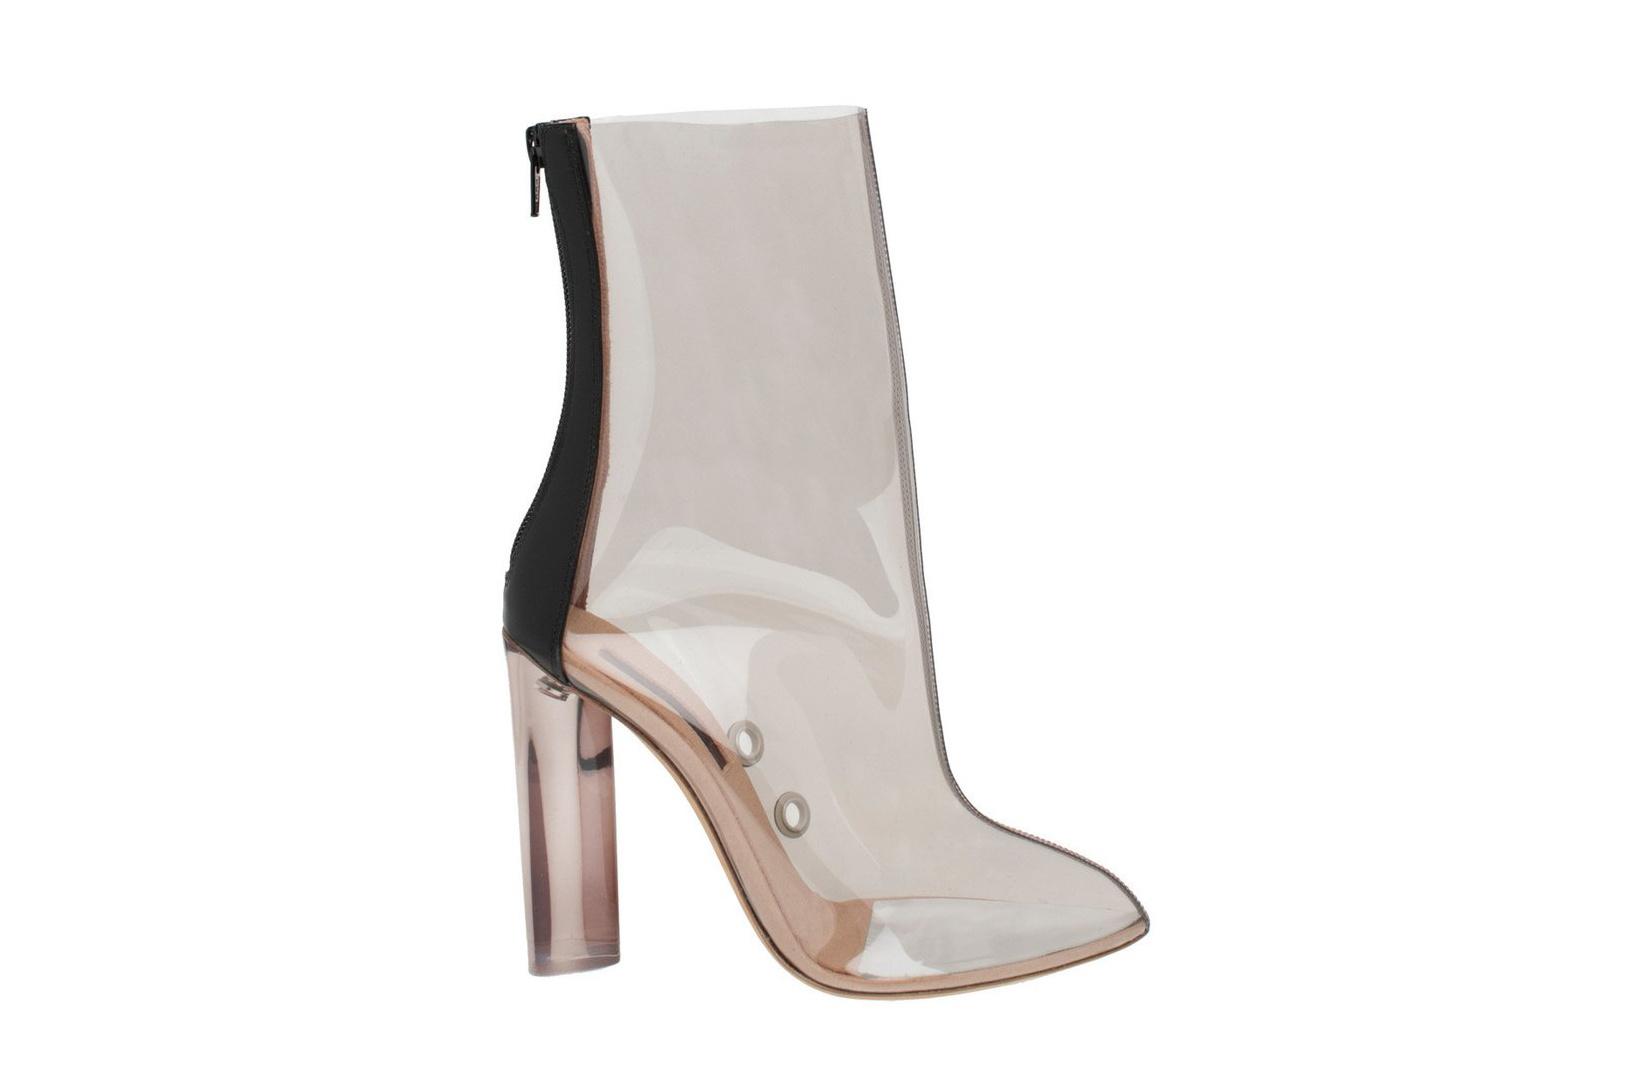 yeezy-season-3-footwear-4.jpg